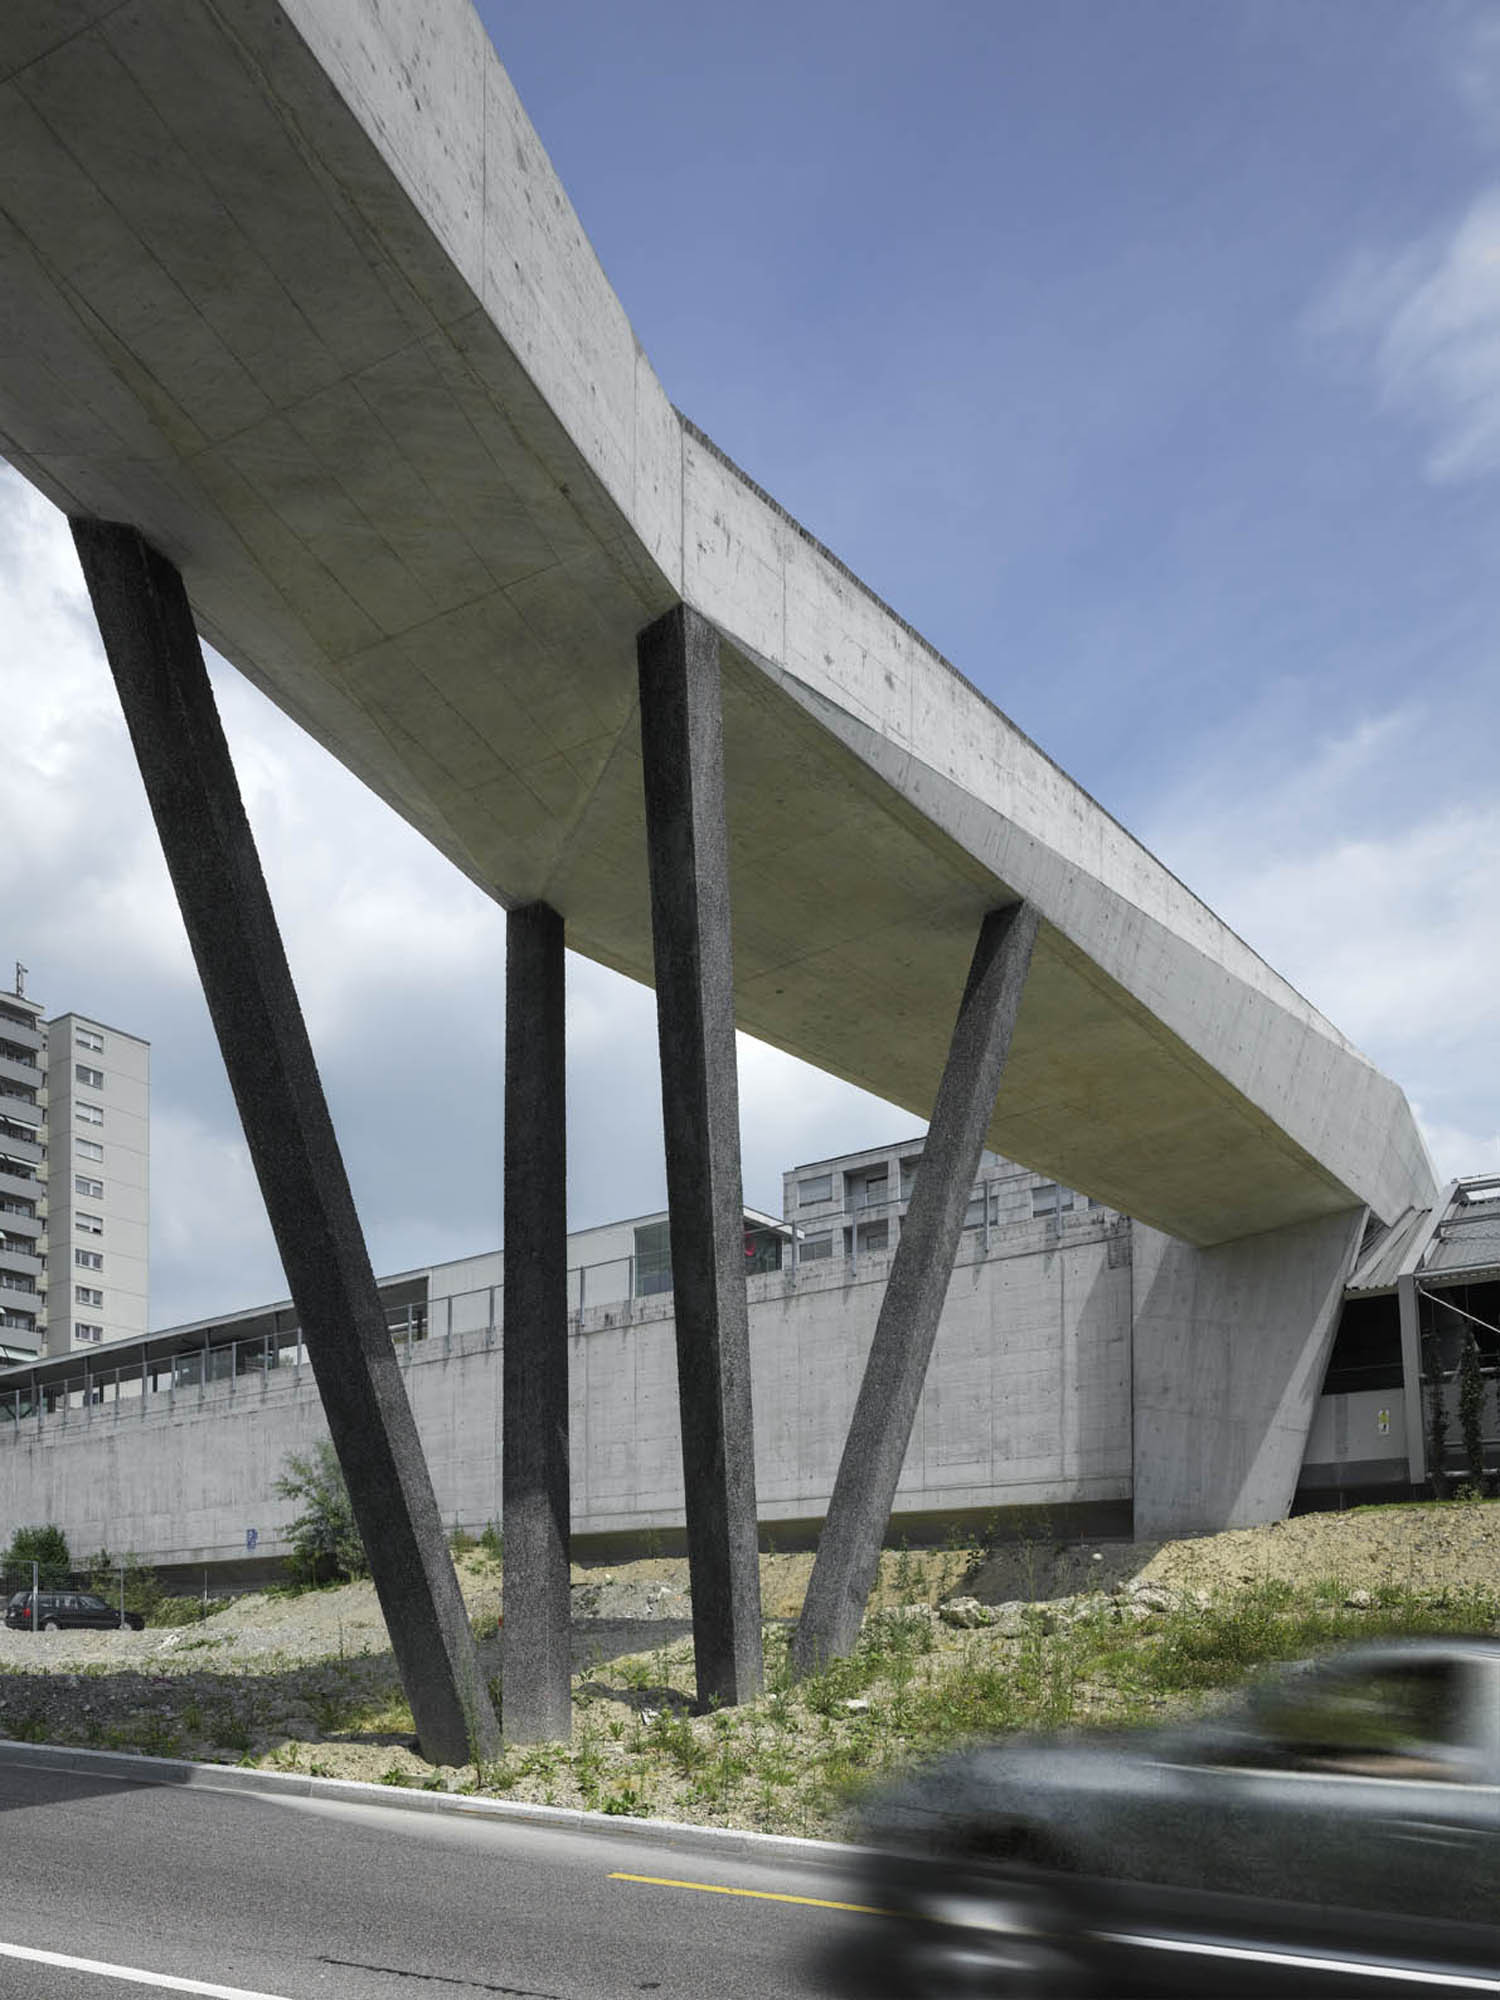 Galeria De Passarela La Sallas 2b Architectes 6